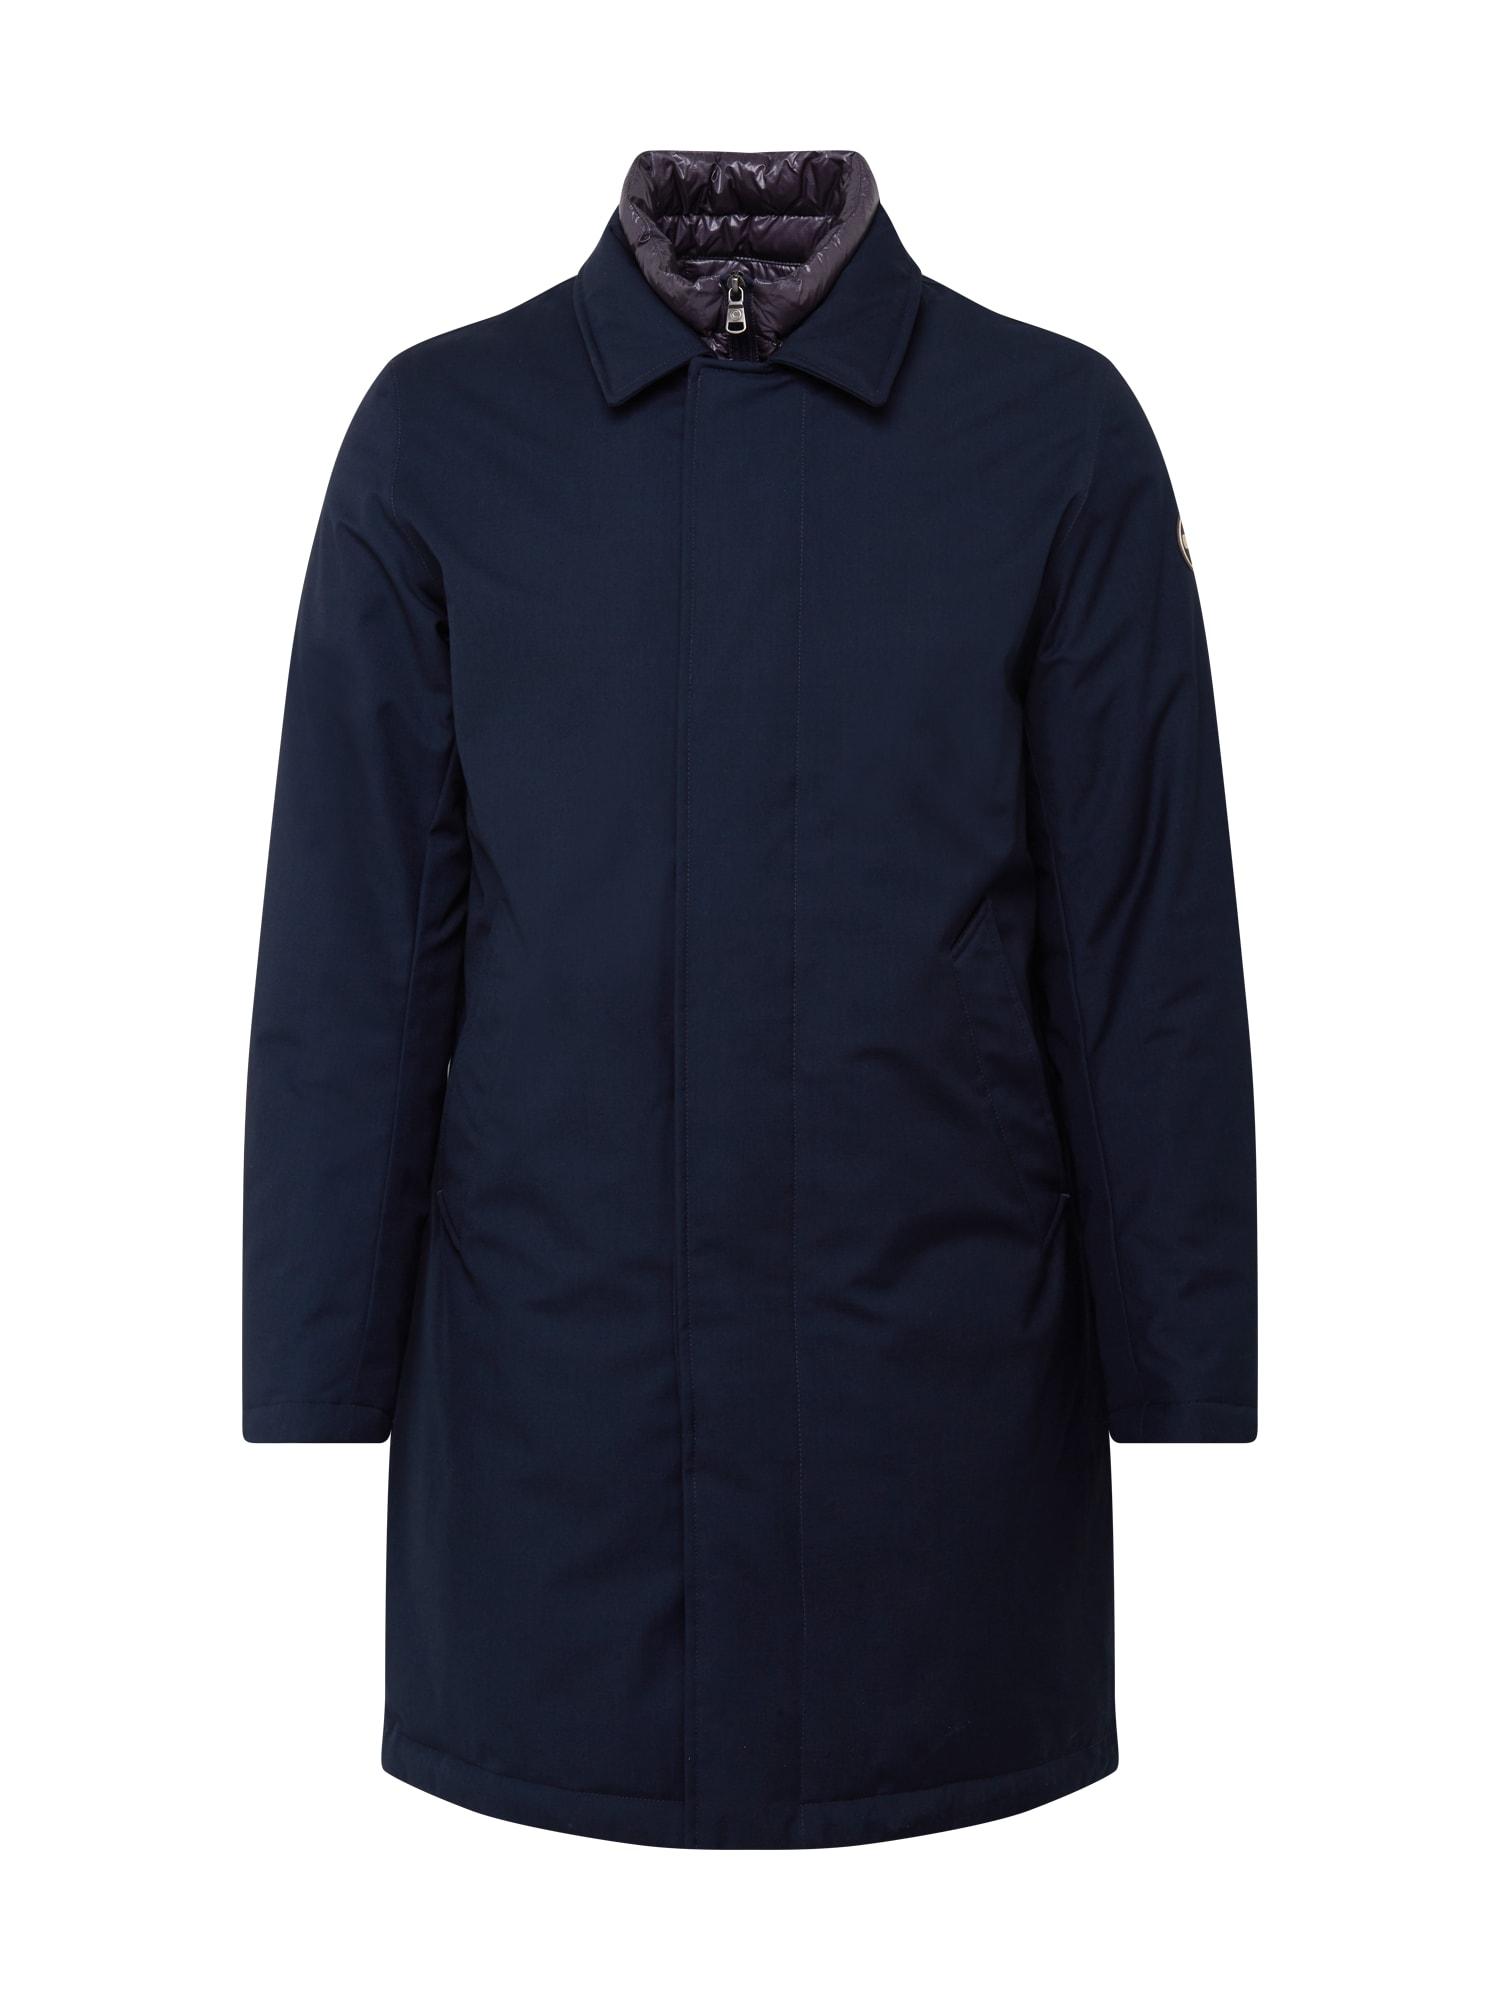 Colmar Zimní kabát 'Matt'  námořnická modř